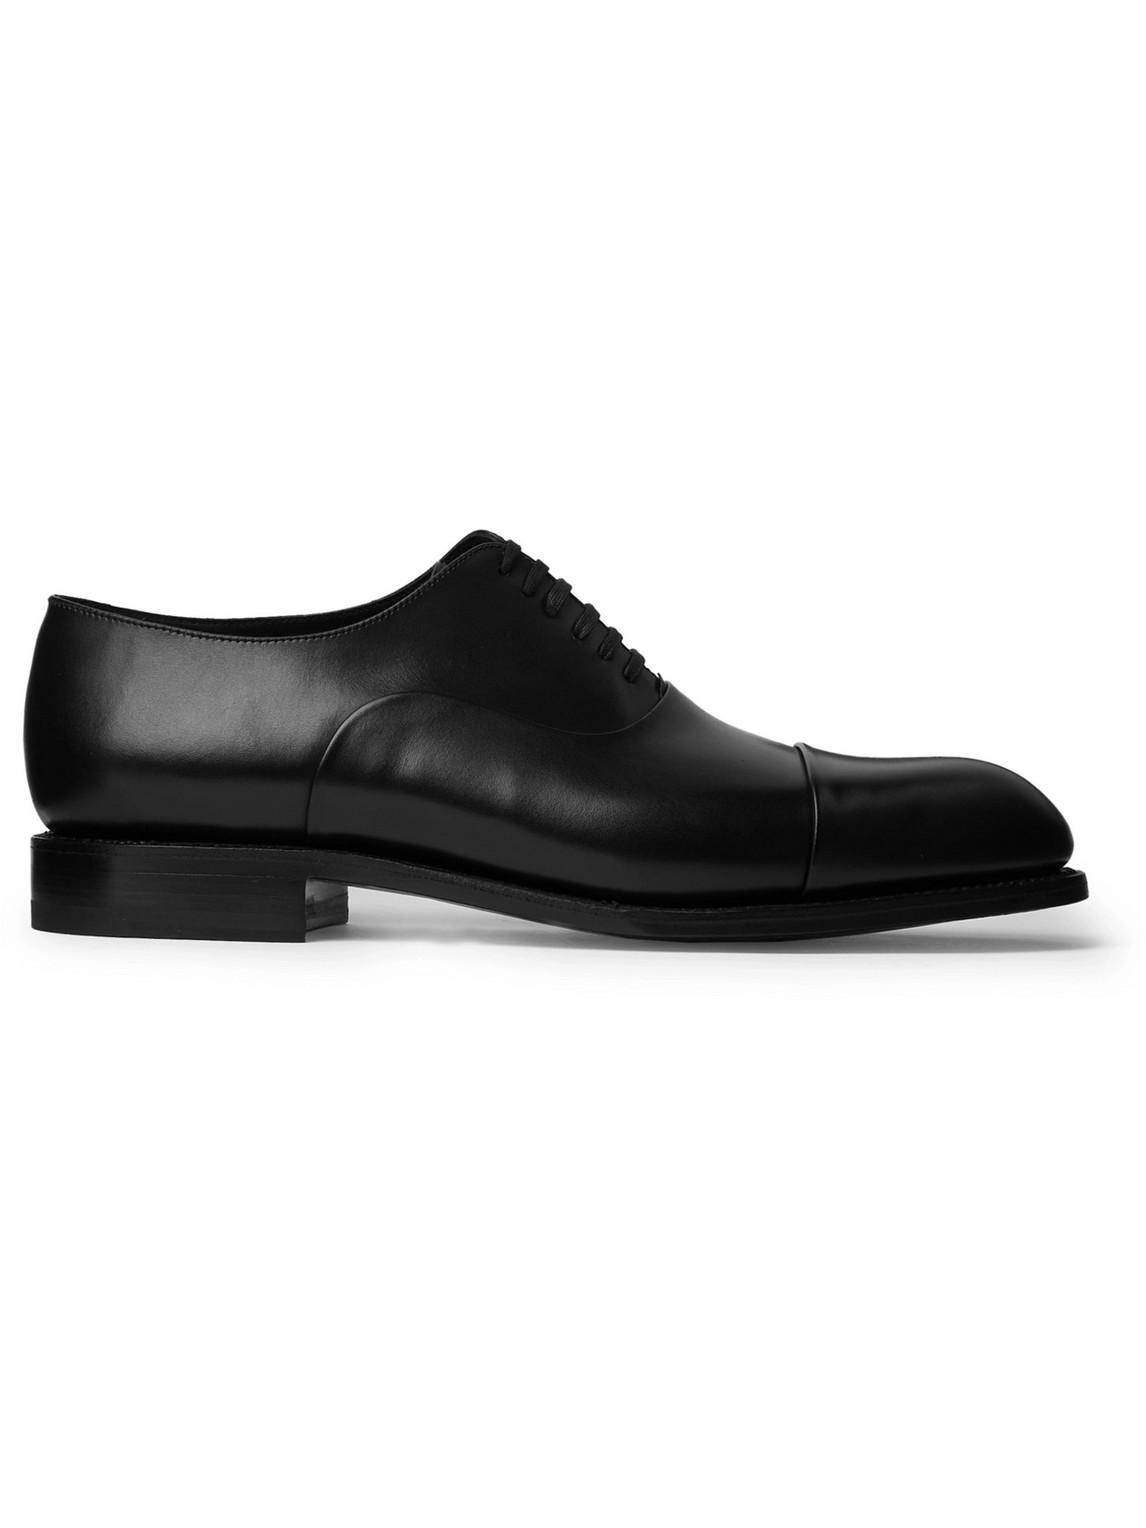 J.M. Weston - Leather Oxford Shoes - Men - Black - Uk 9